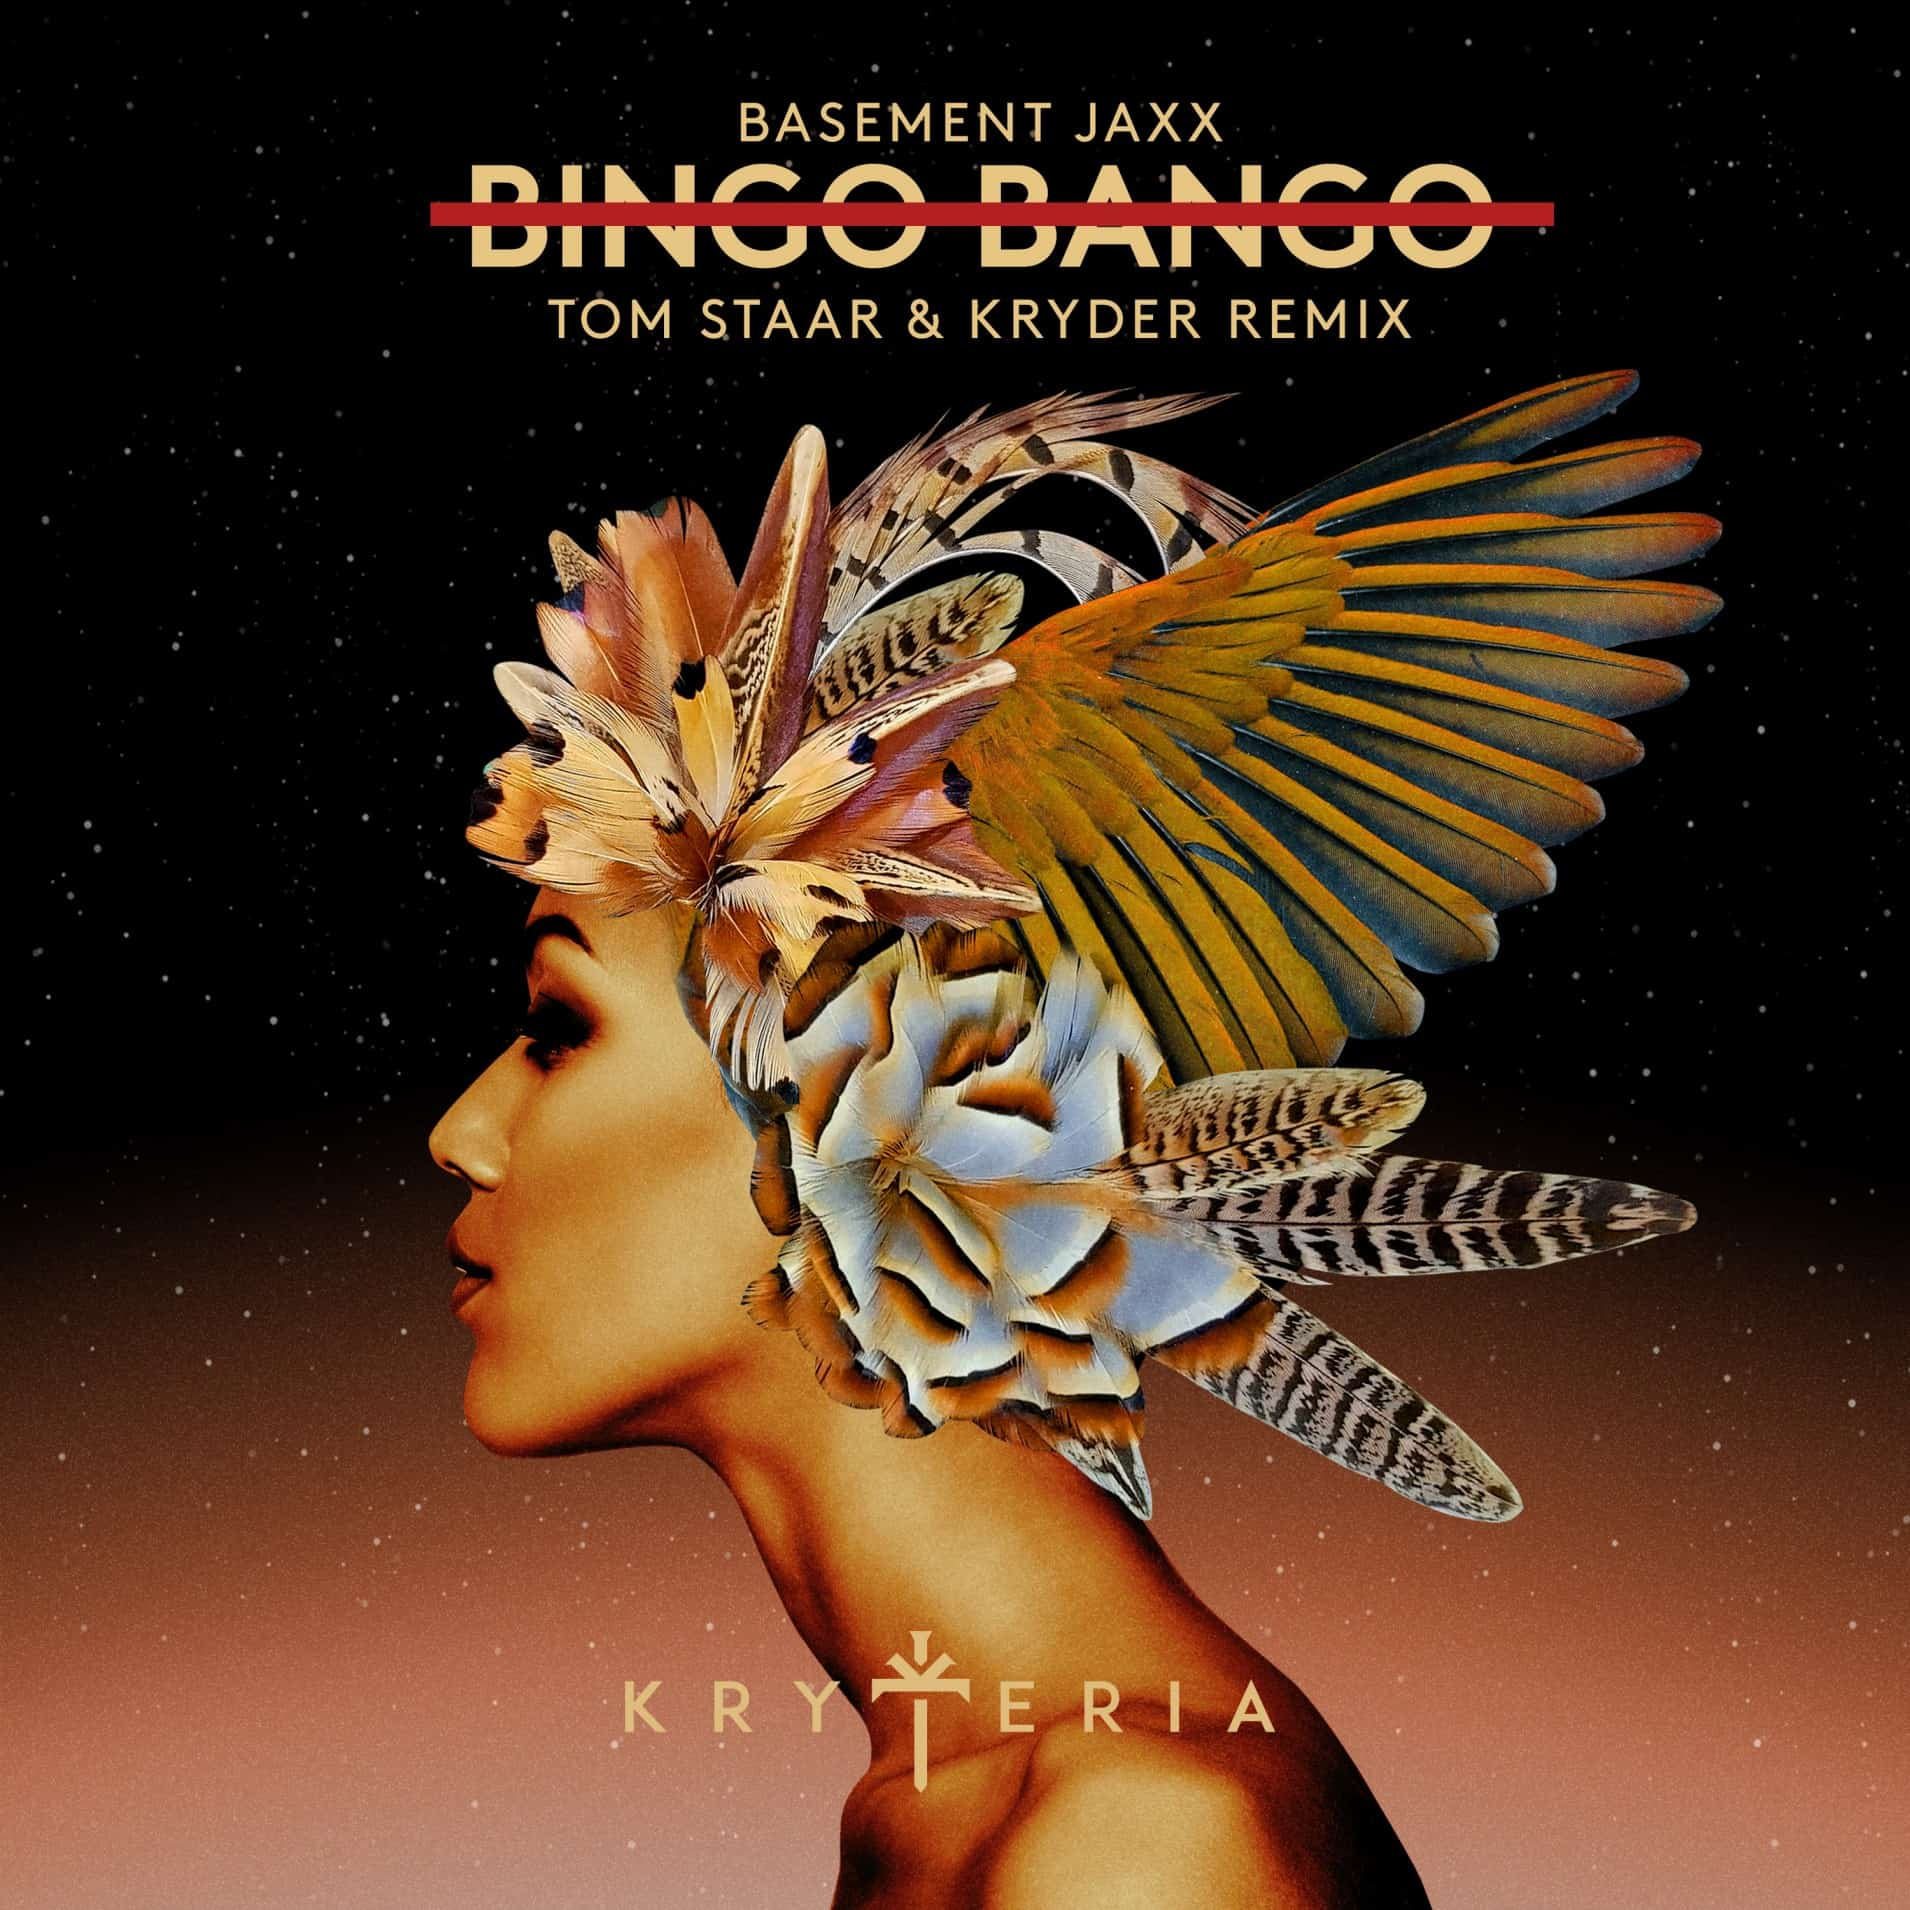 Kryteria drops Basement Jaxx – Bingo Bango (Kryder & Tom Staar remix)